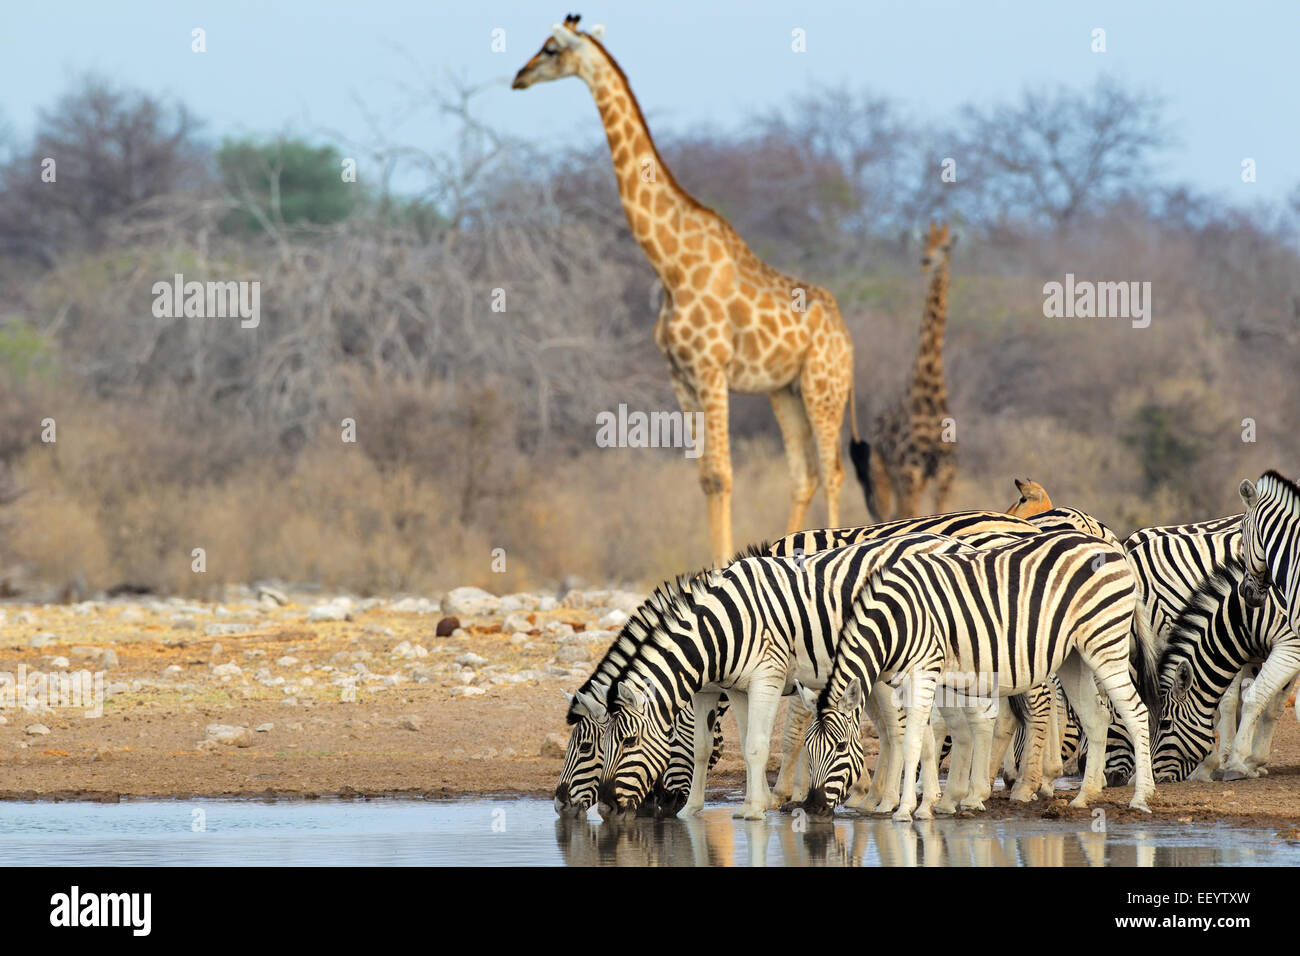 Giraffe Zebras Safari Stock Photos Amp Giraffe Zebras Safari